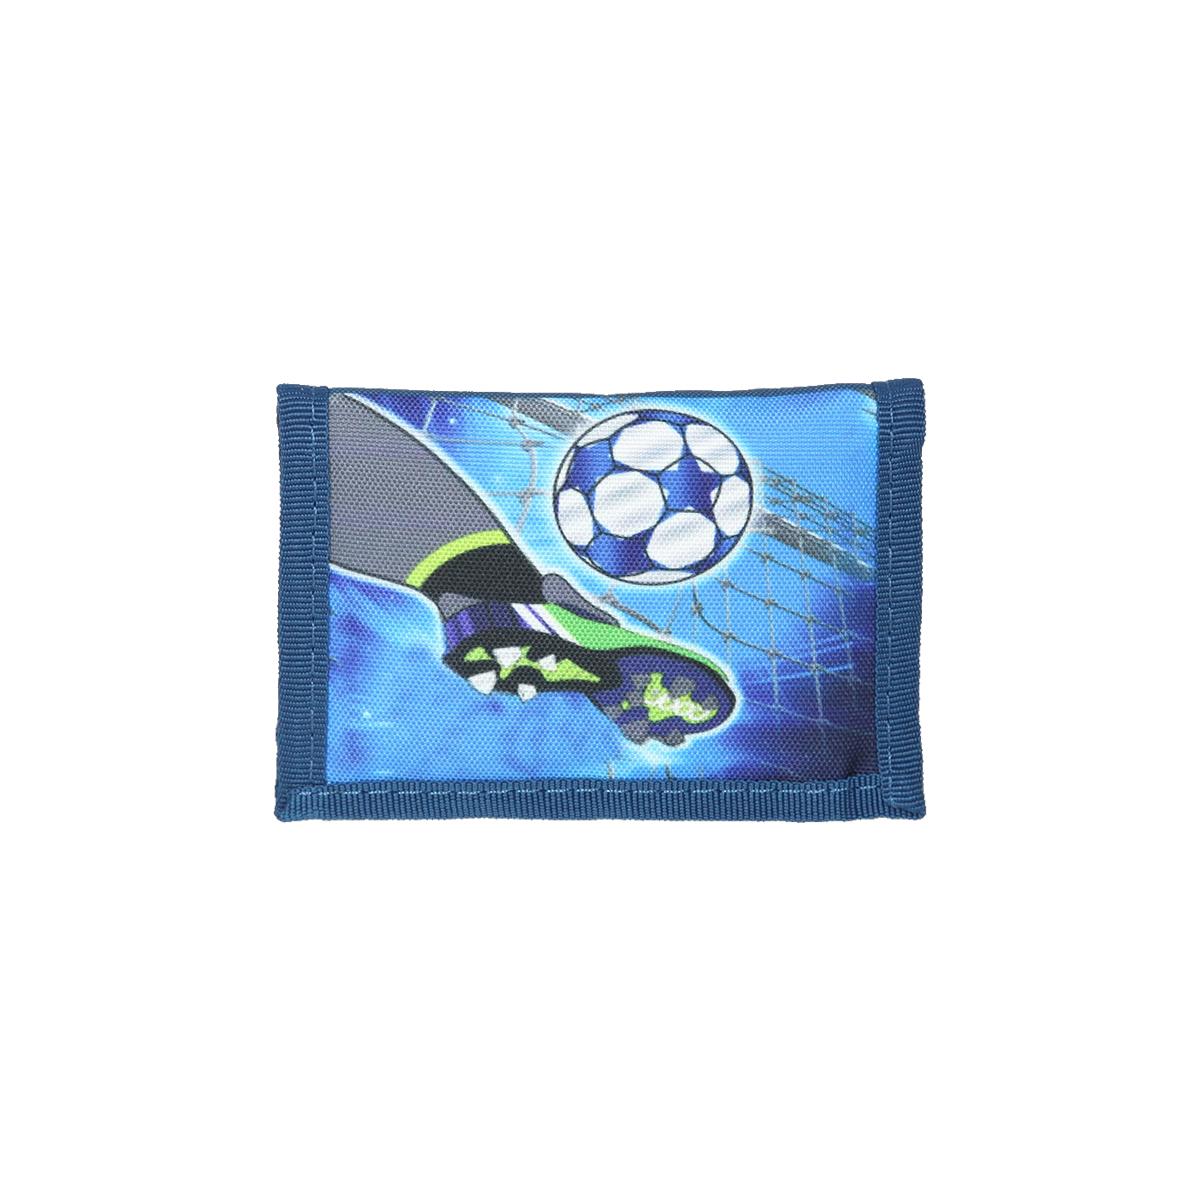 Torba set ''Football goal'', metalna kopča